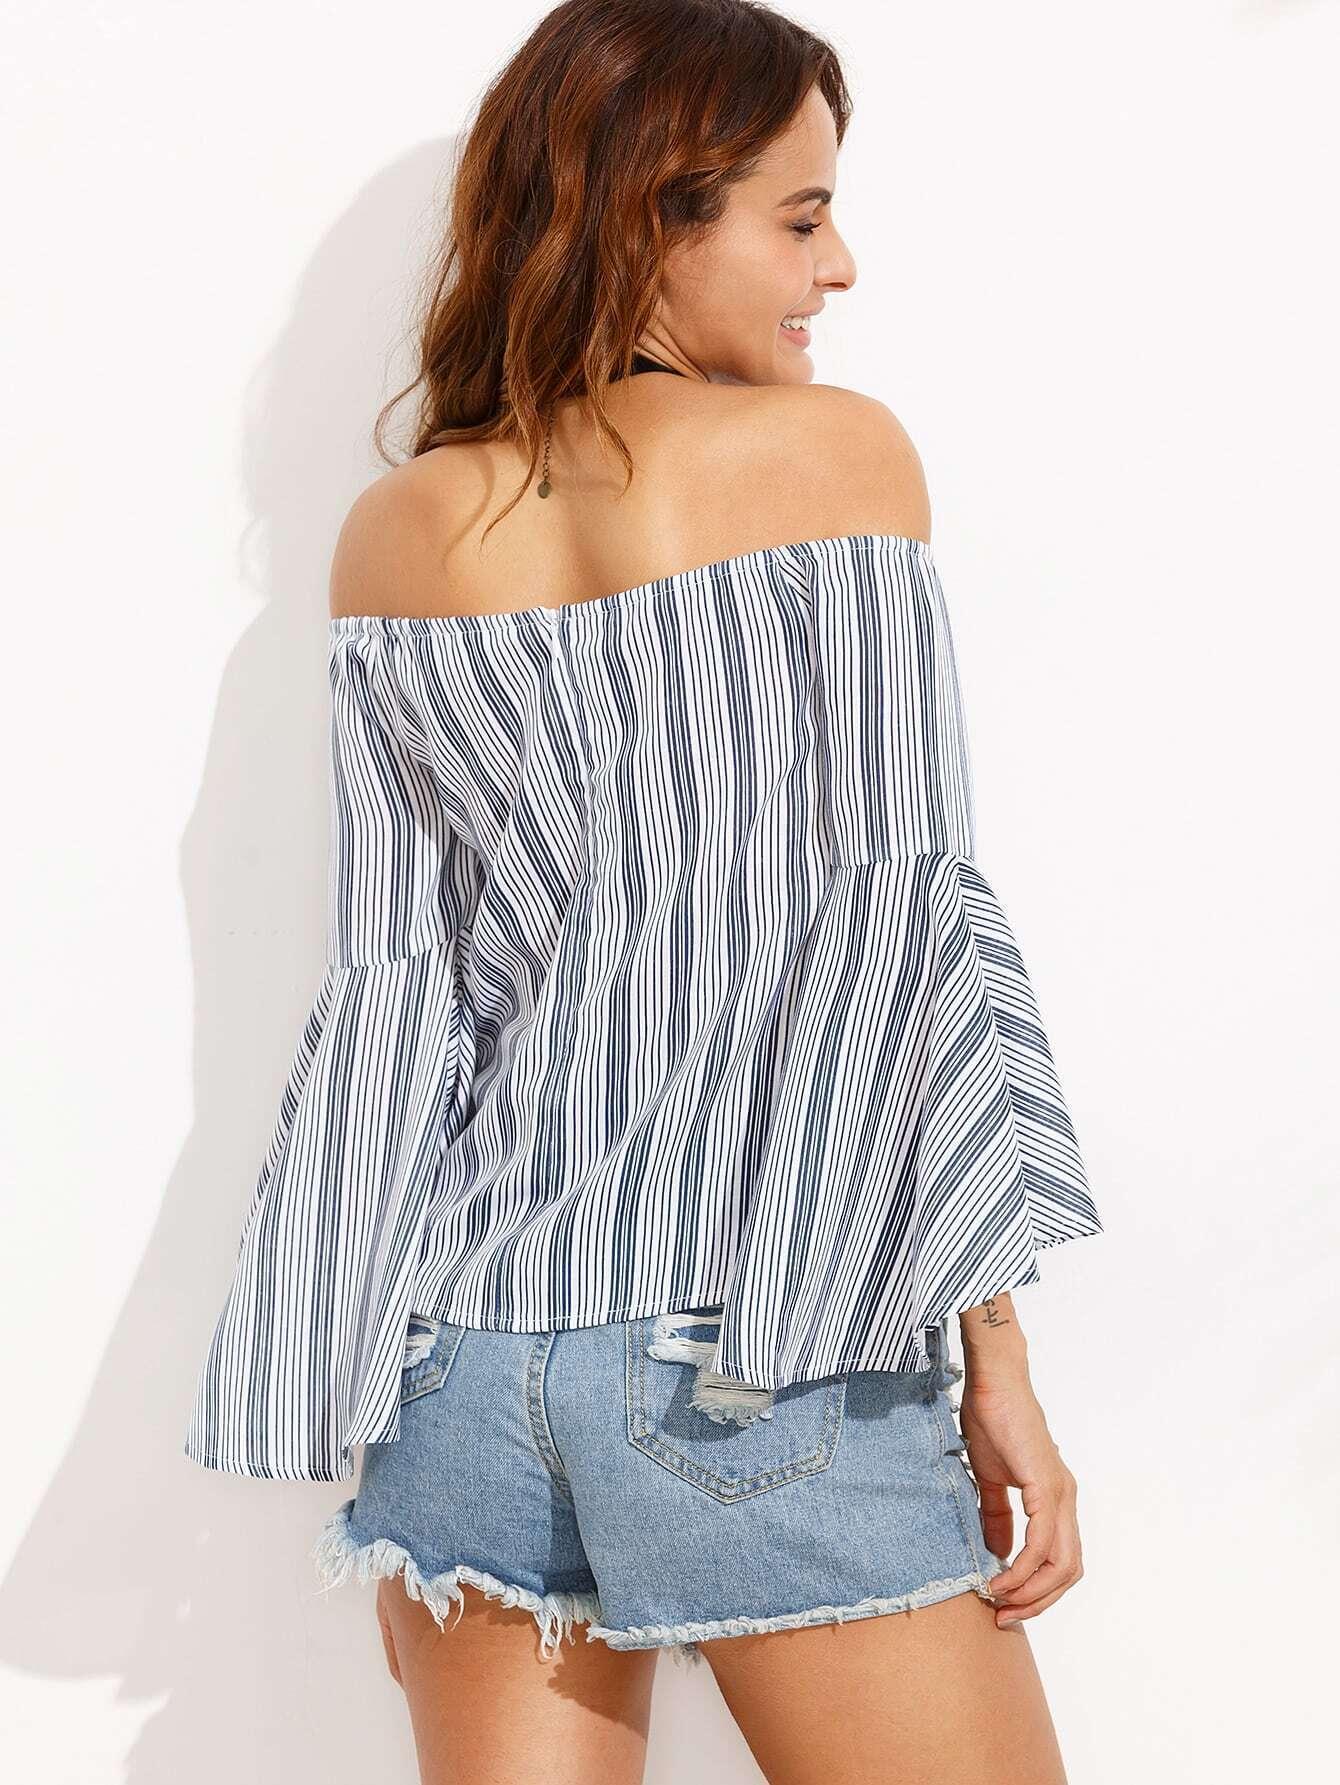 blouse160729719_4